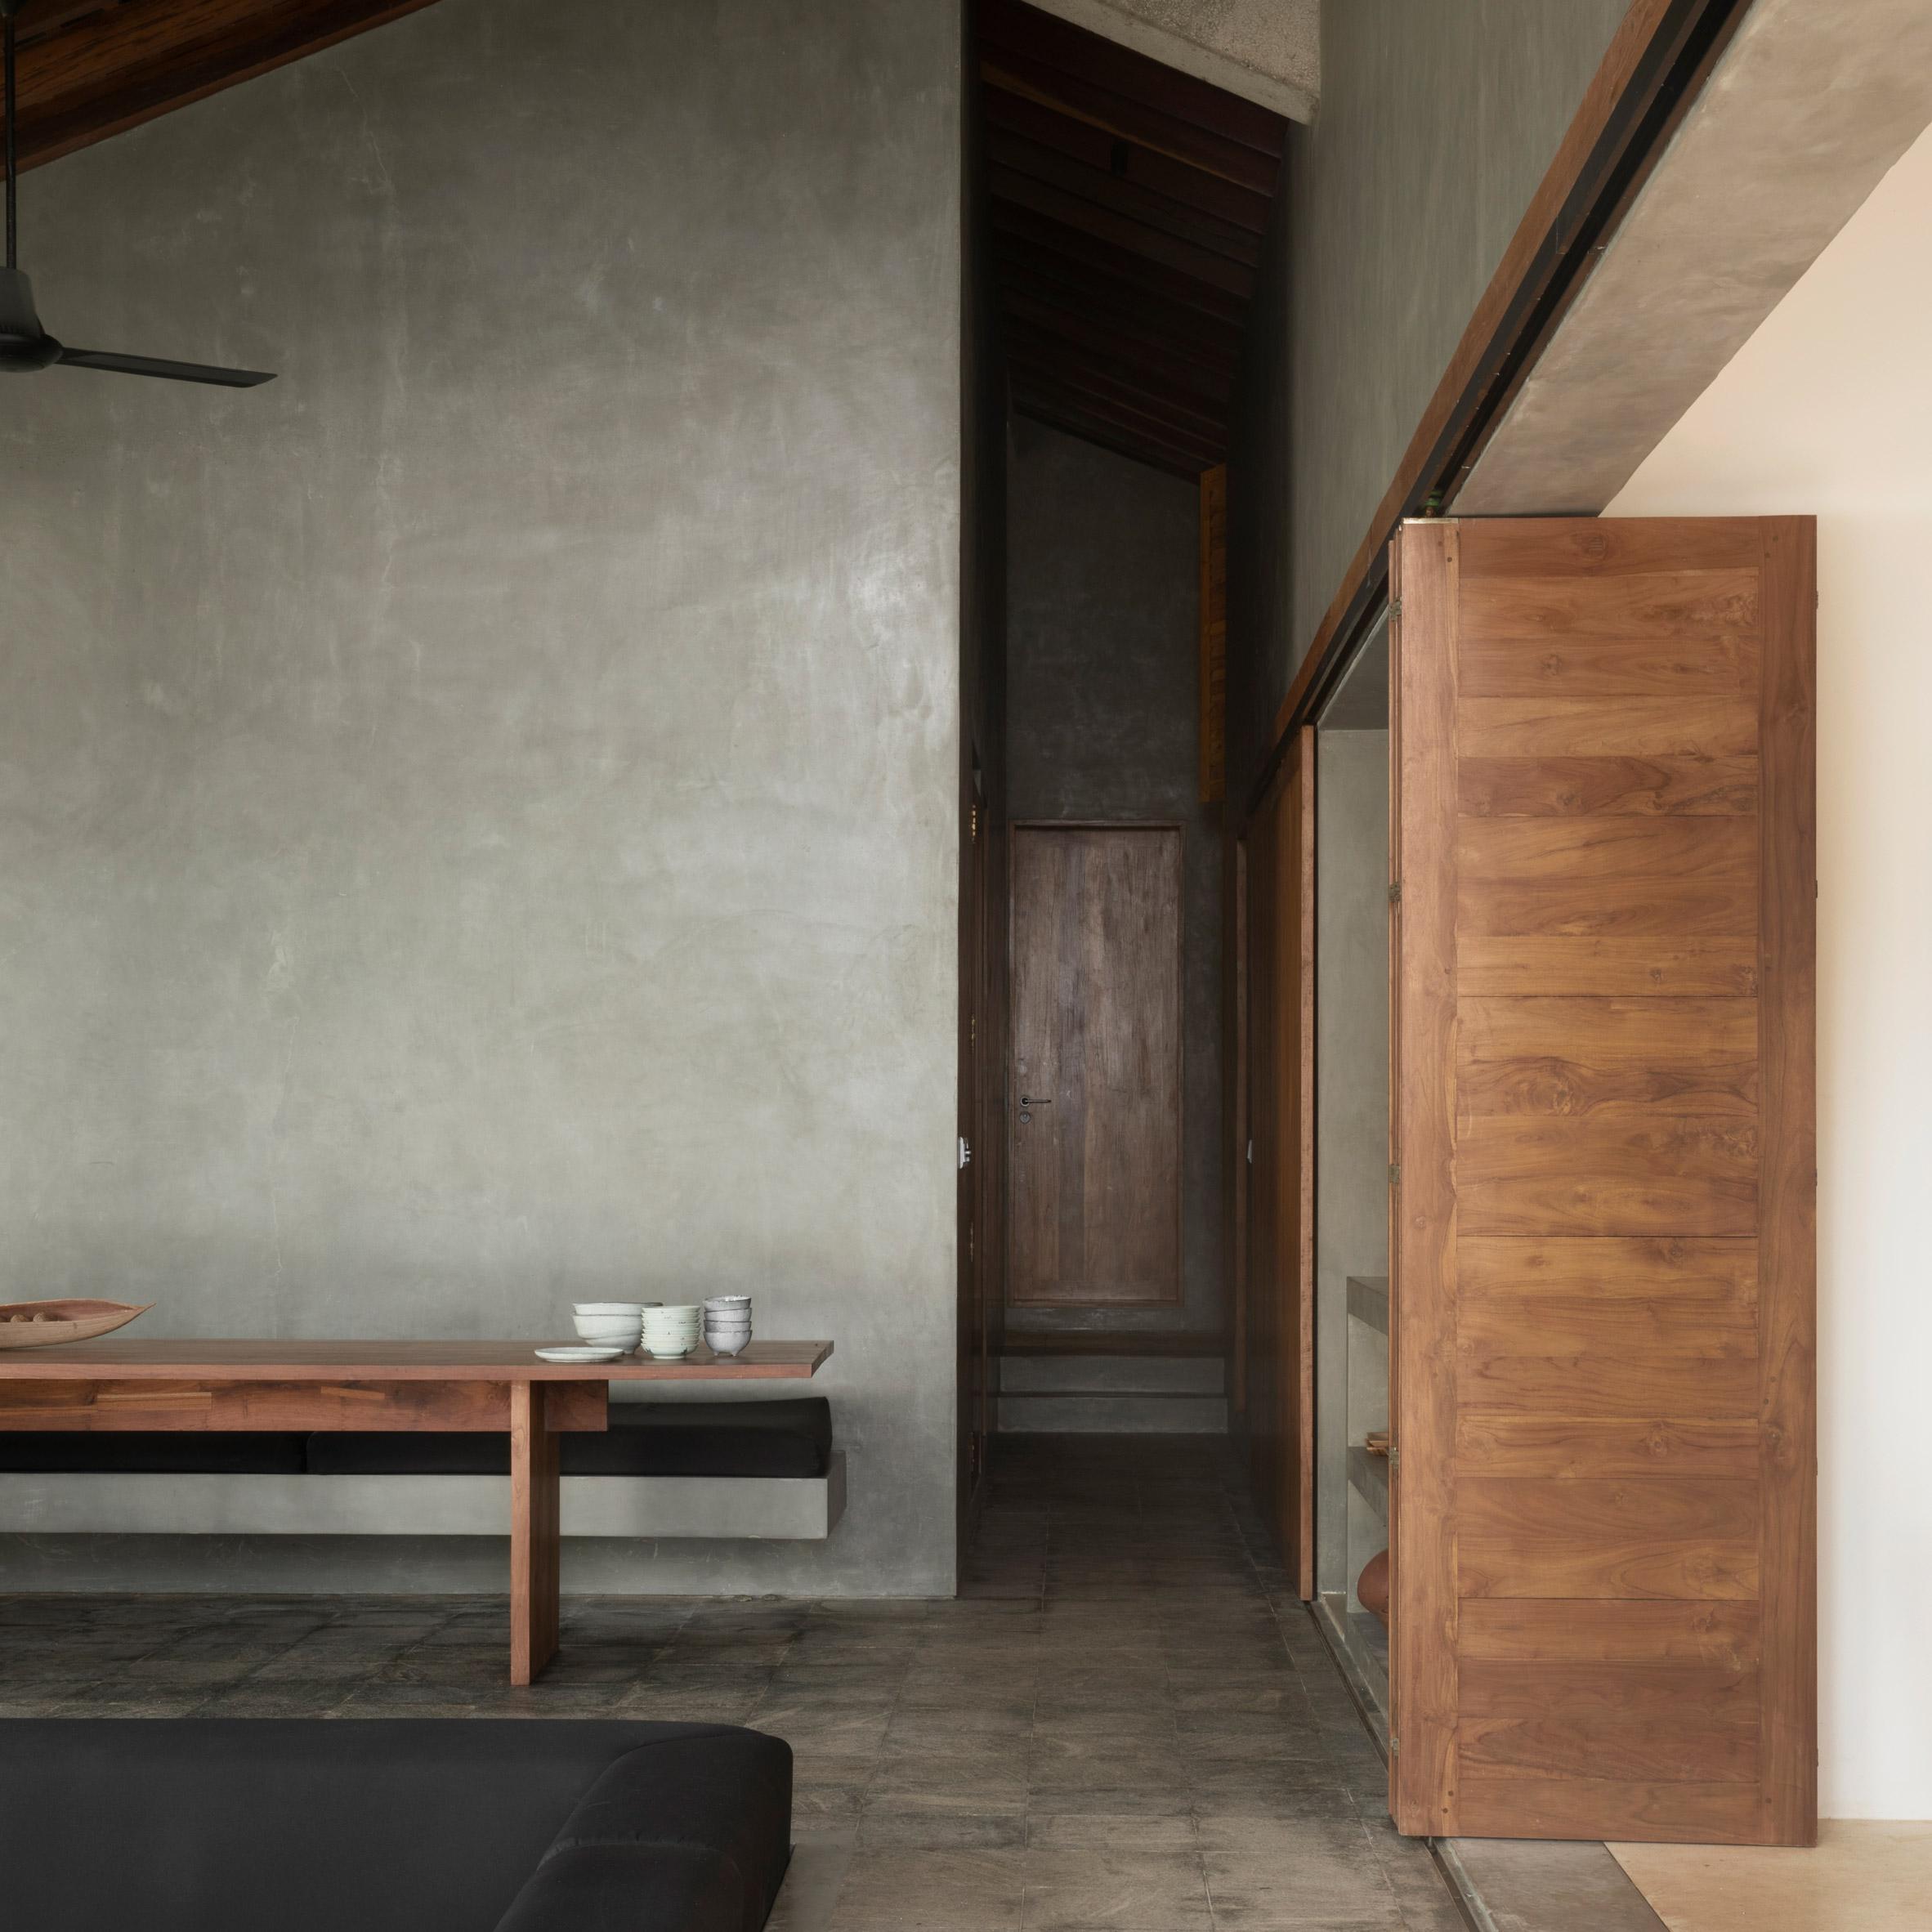 Concrete Surfaces Evoke Rough Luxury Inside Sri Lanka S K House,Pinterest Home Wedding Decoration